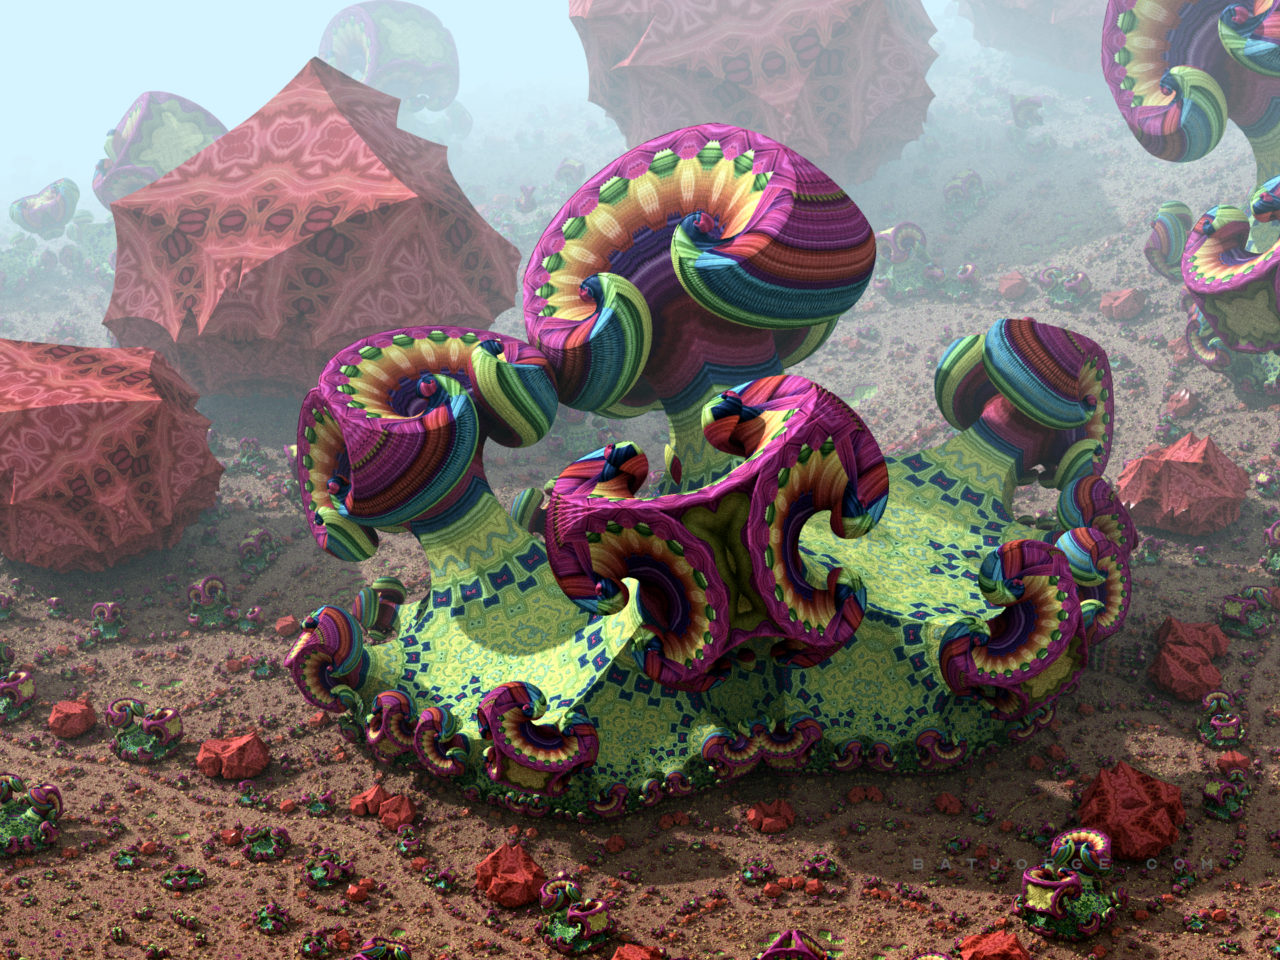 3d fractal.organic look. mushroom like. psychedelic colors